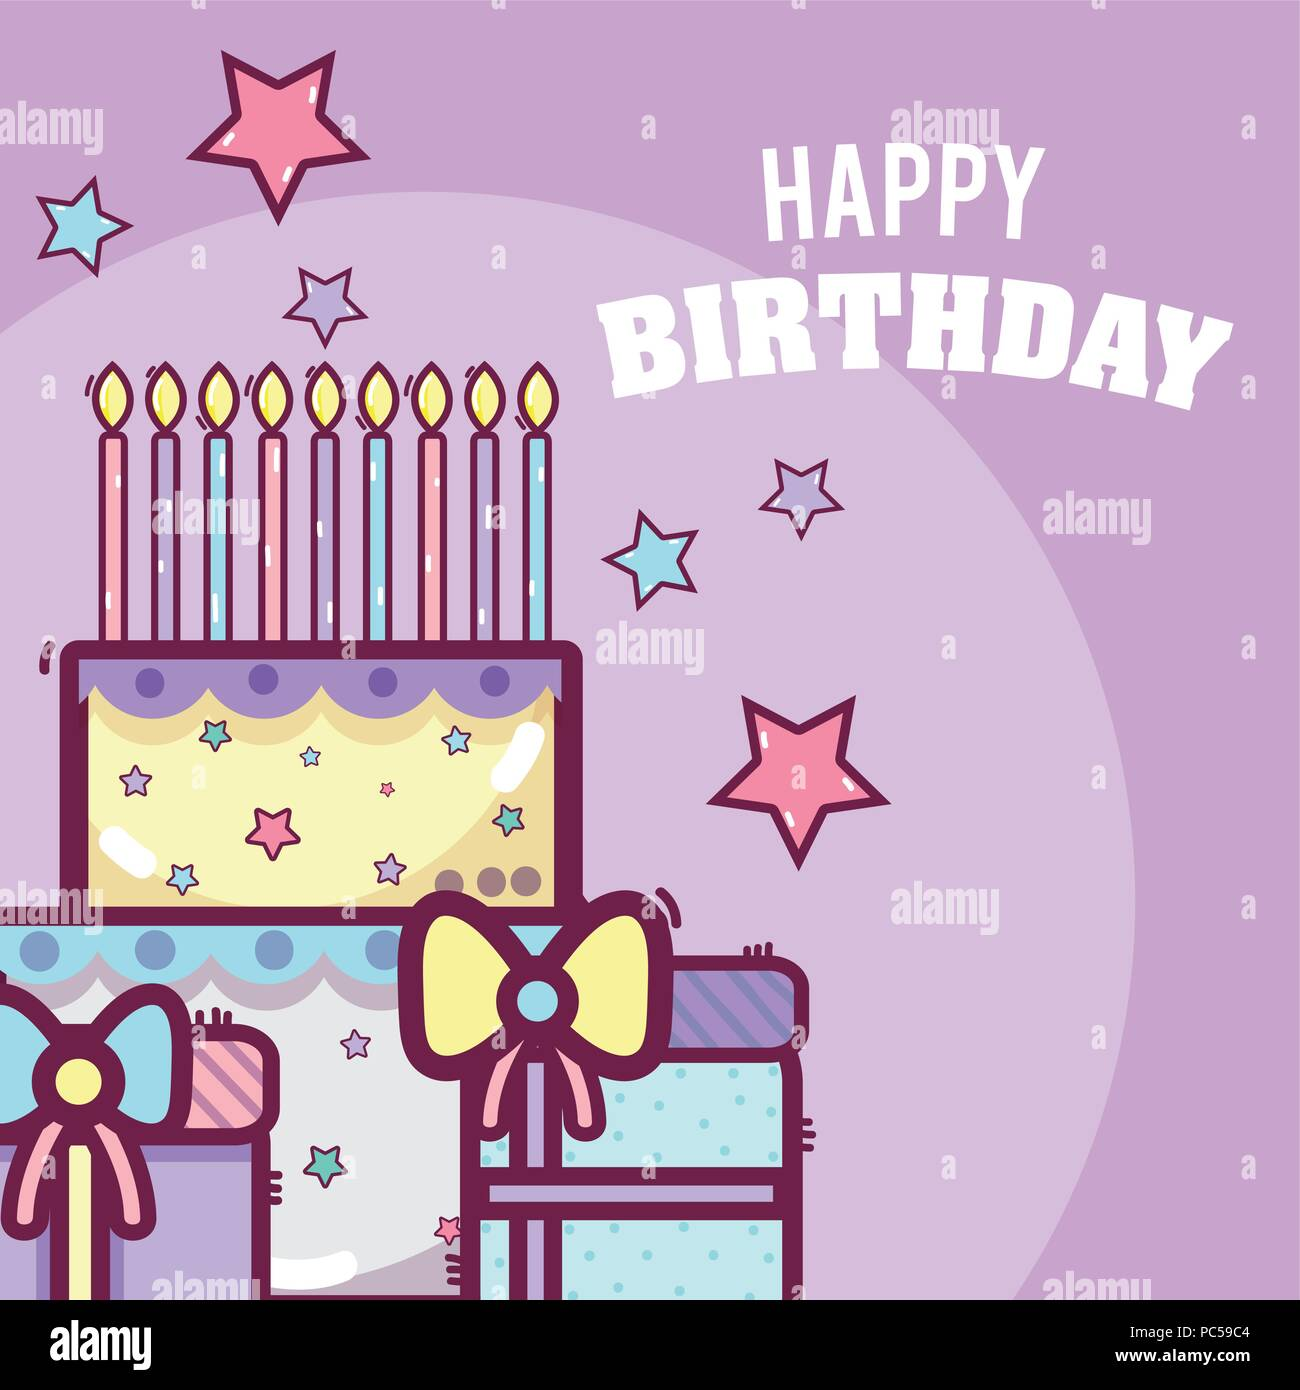 Happy birthday card - Stock Image